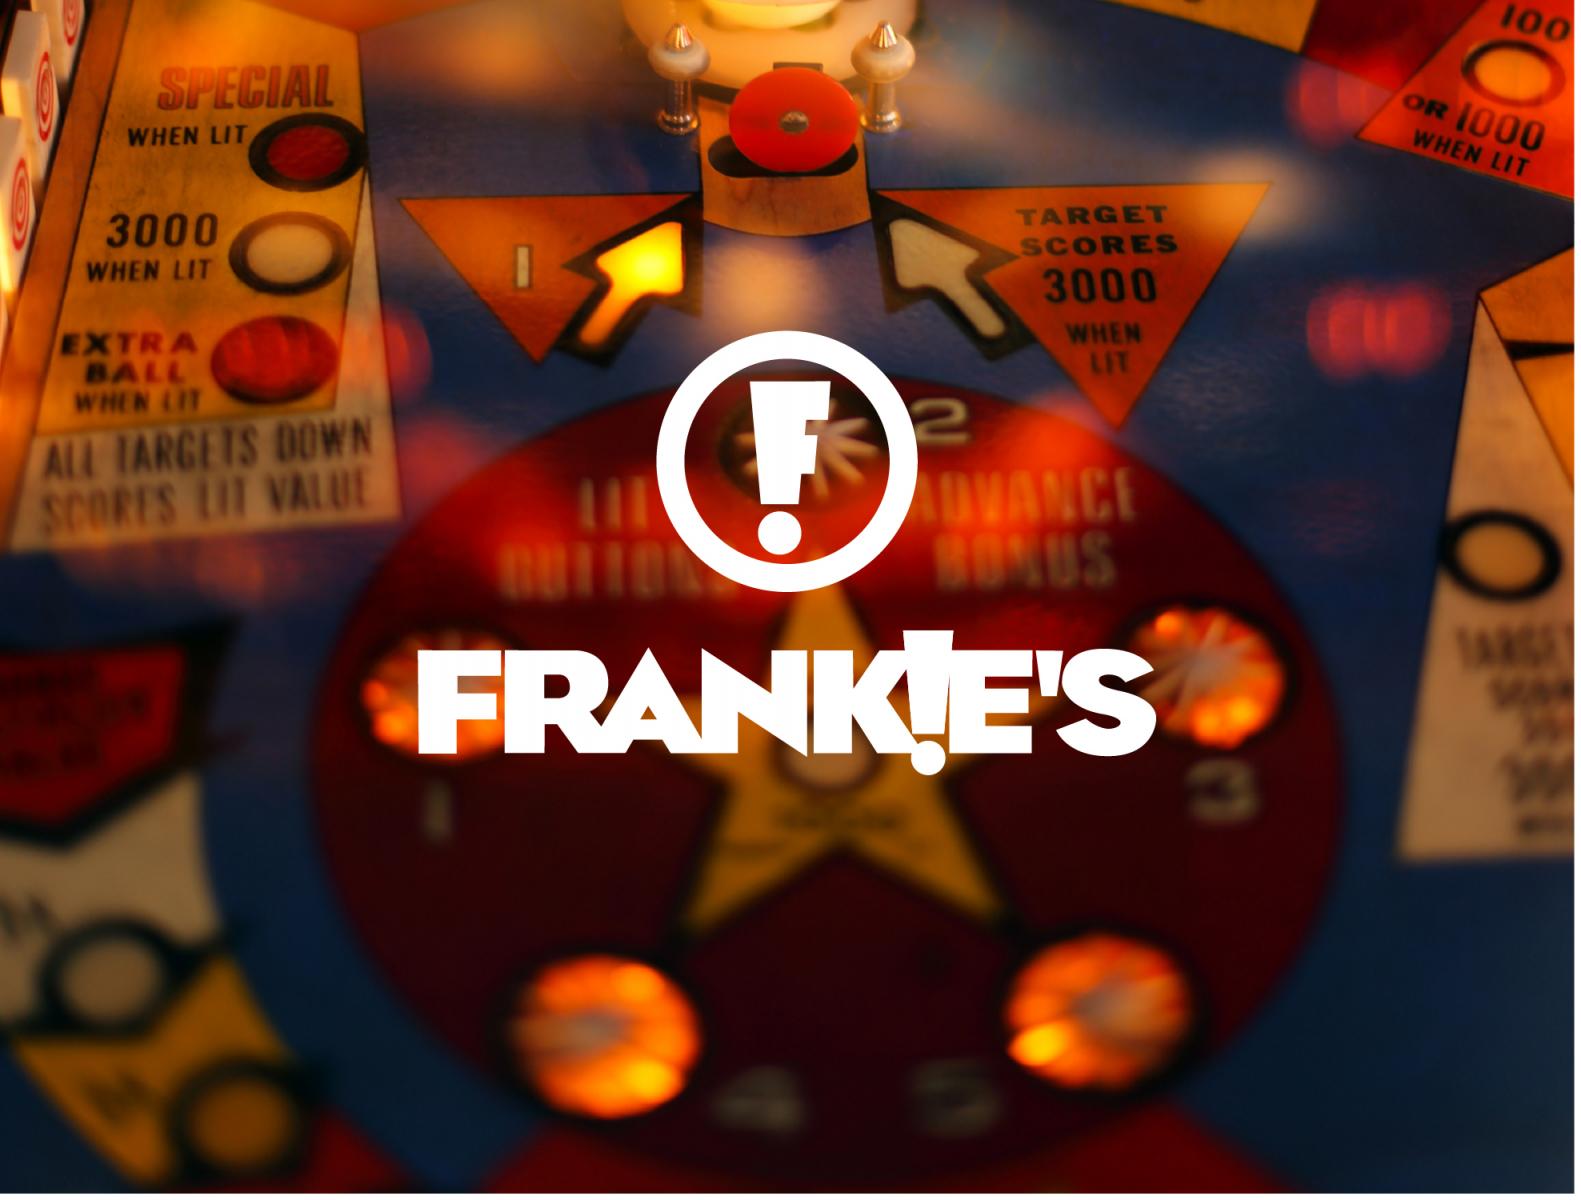 Frankies